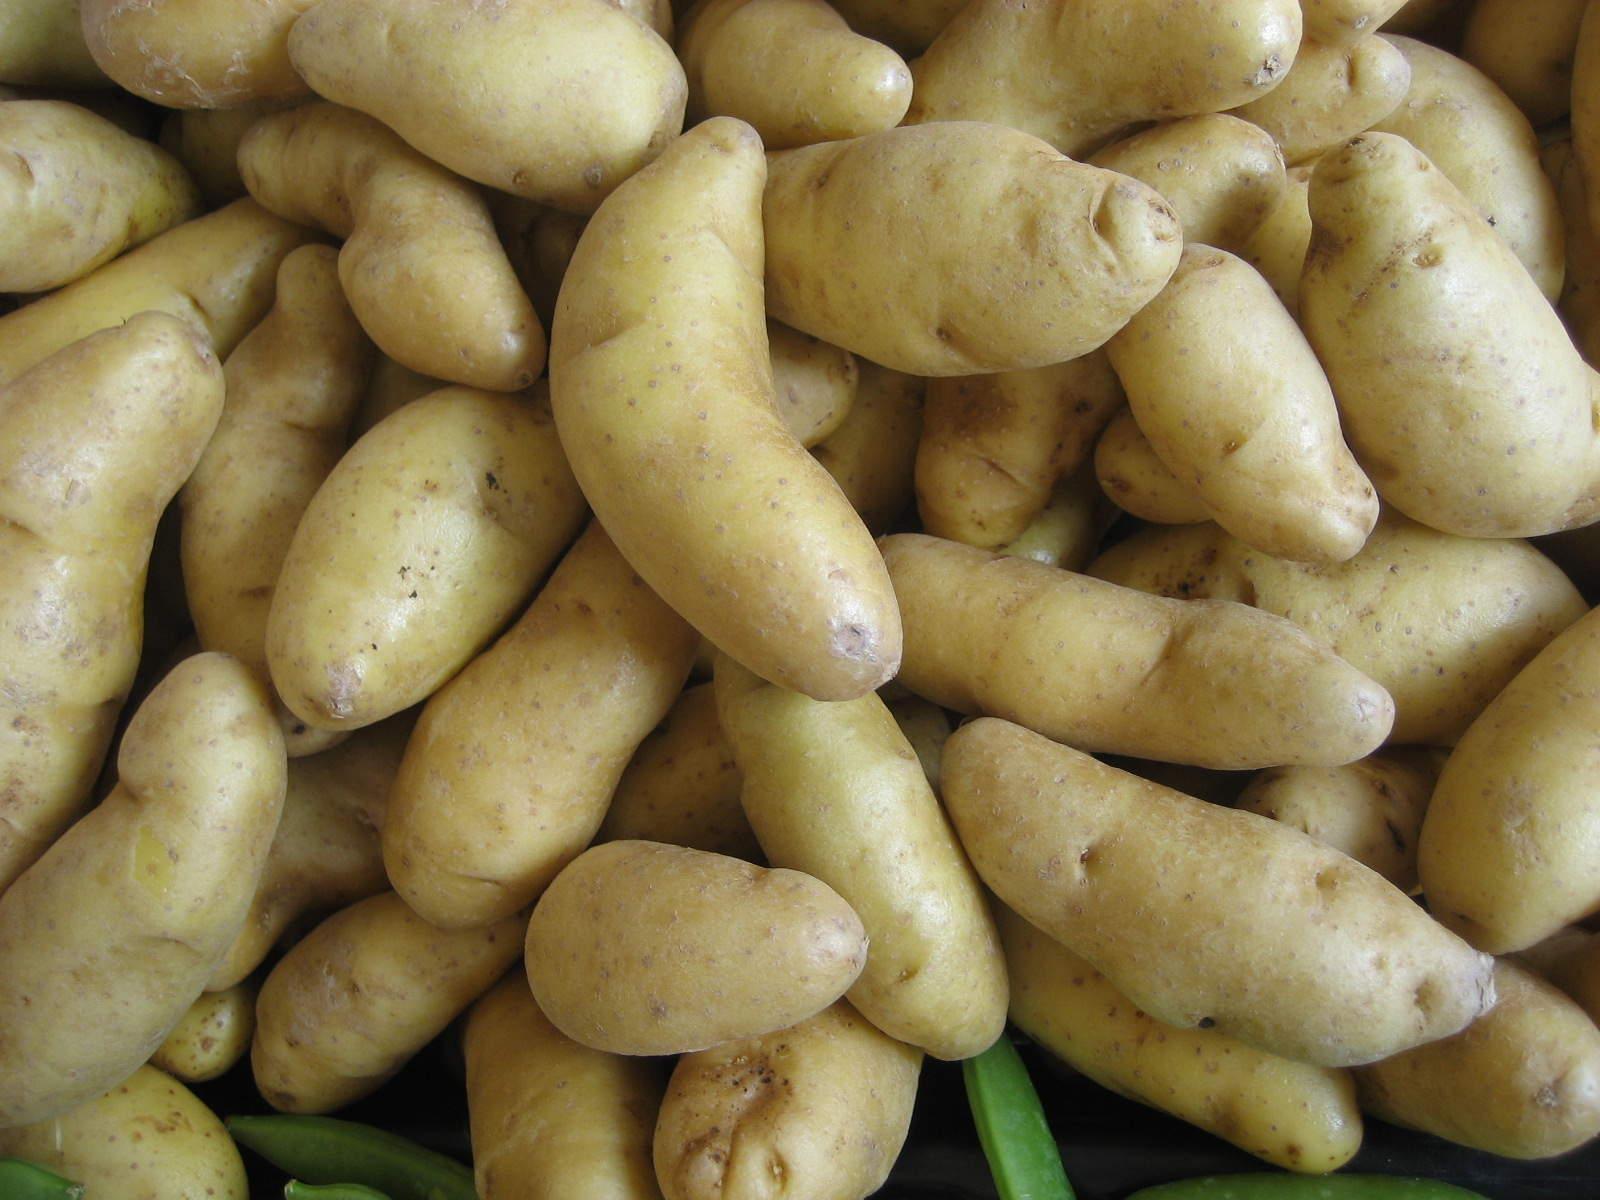 Potatoes – Fingerling Yellow ONTARIO (Pint/Approx 1LB)